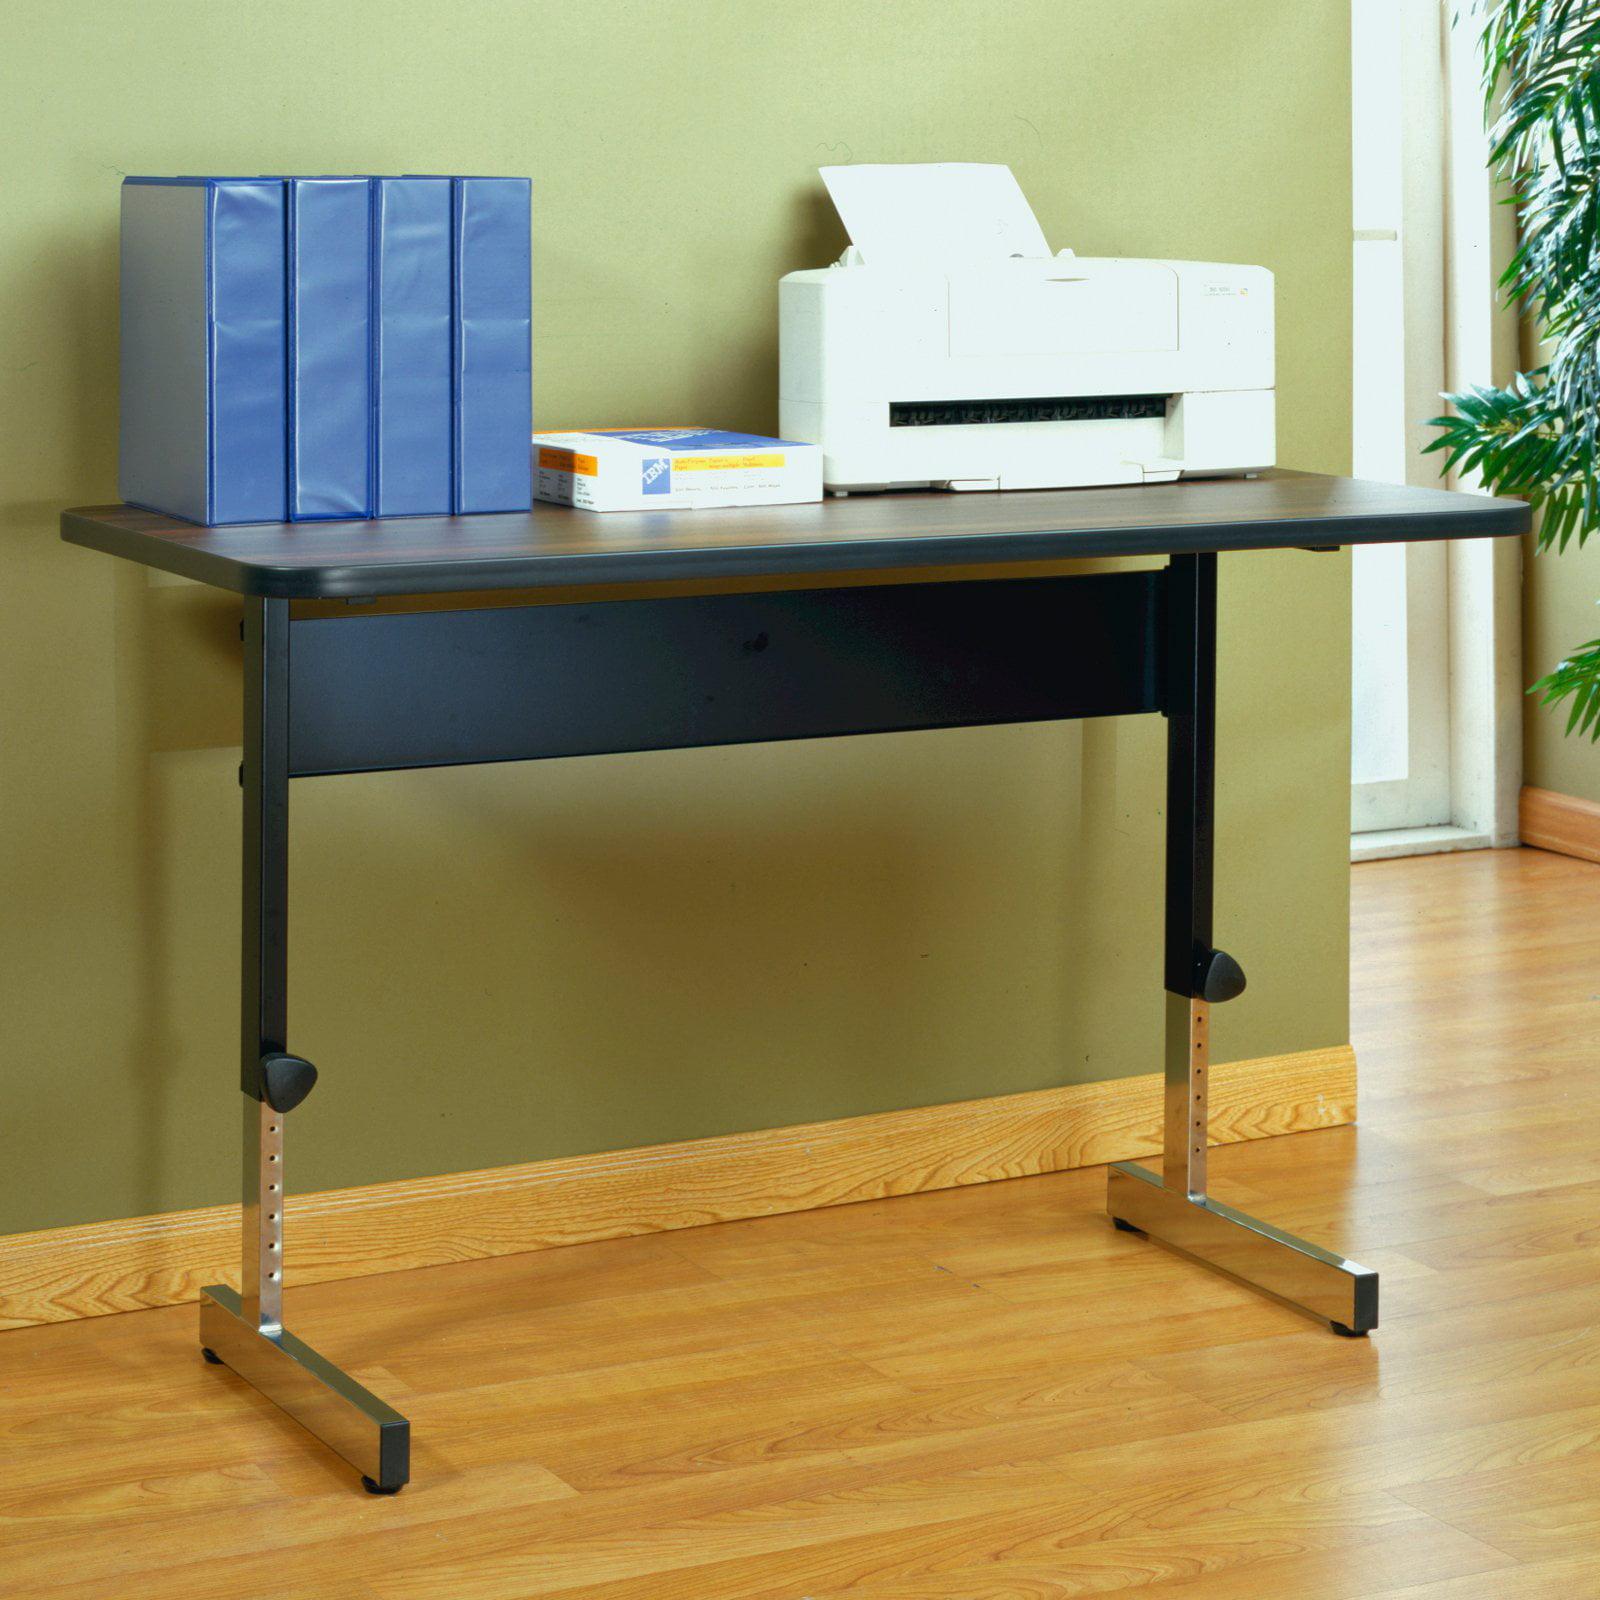 "Calico Designs Adapta Desk 48"" W, Black and Walnut"